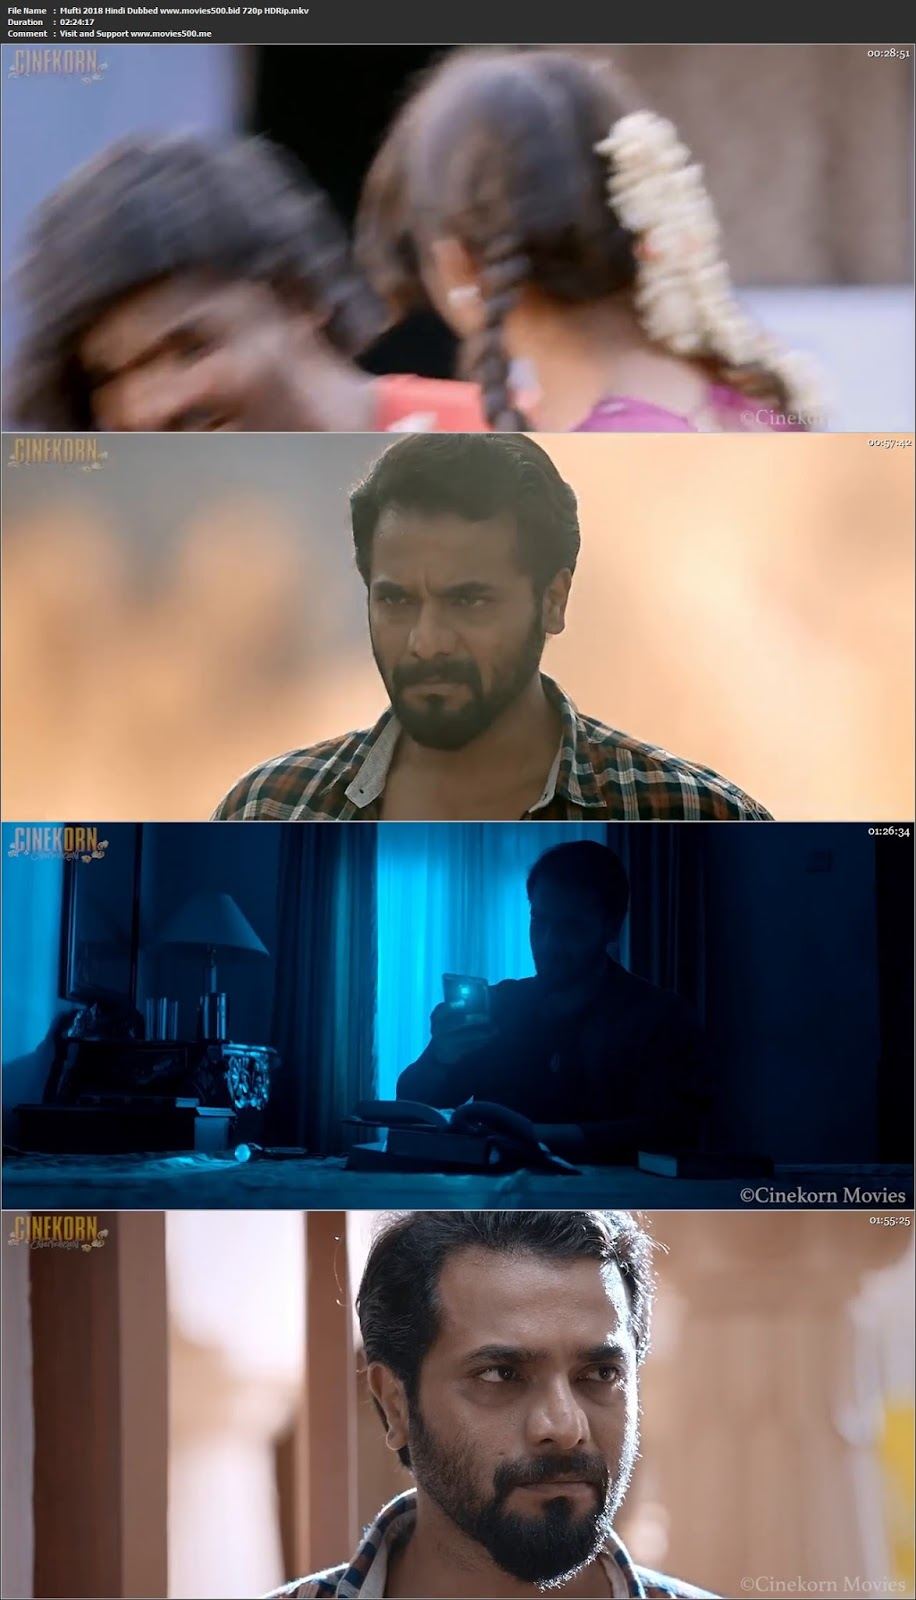 Mufti 2018 Hindi Dubbed Full Movie HDRip 720p at xn--o9jyb9aa09c103qnhe3m5i.com